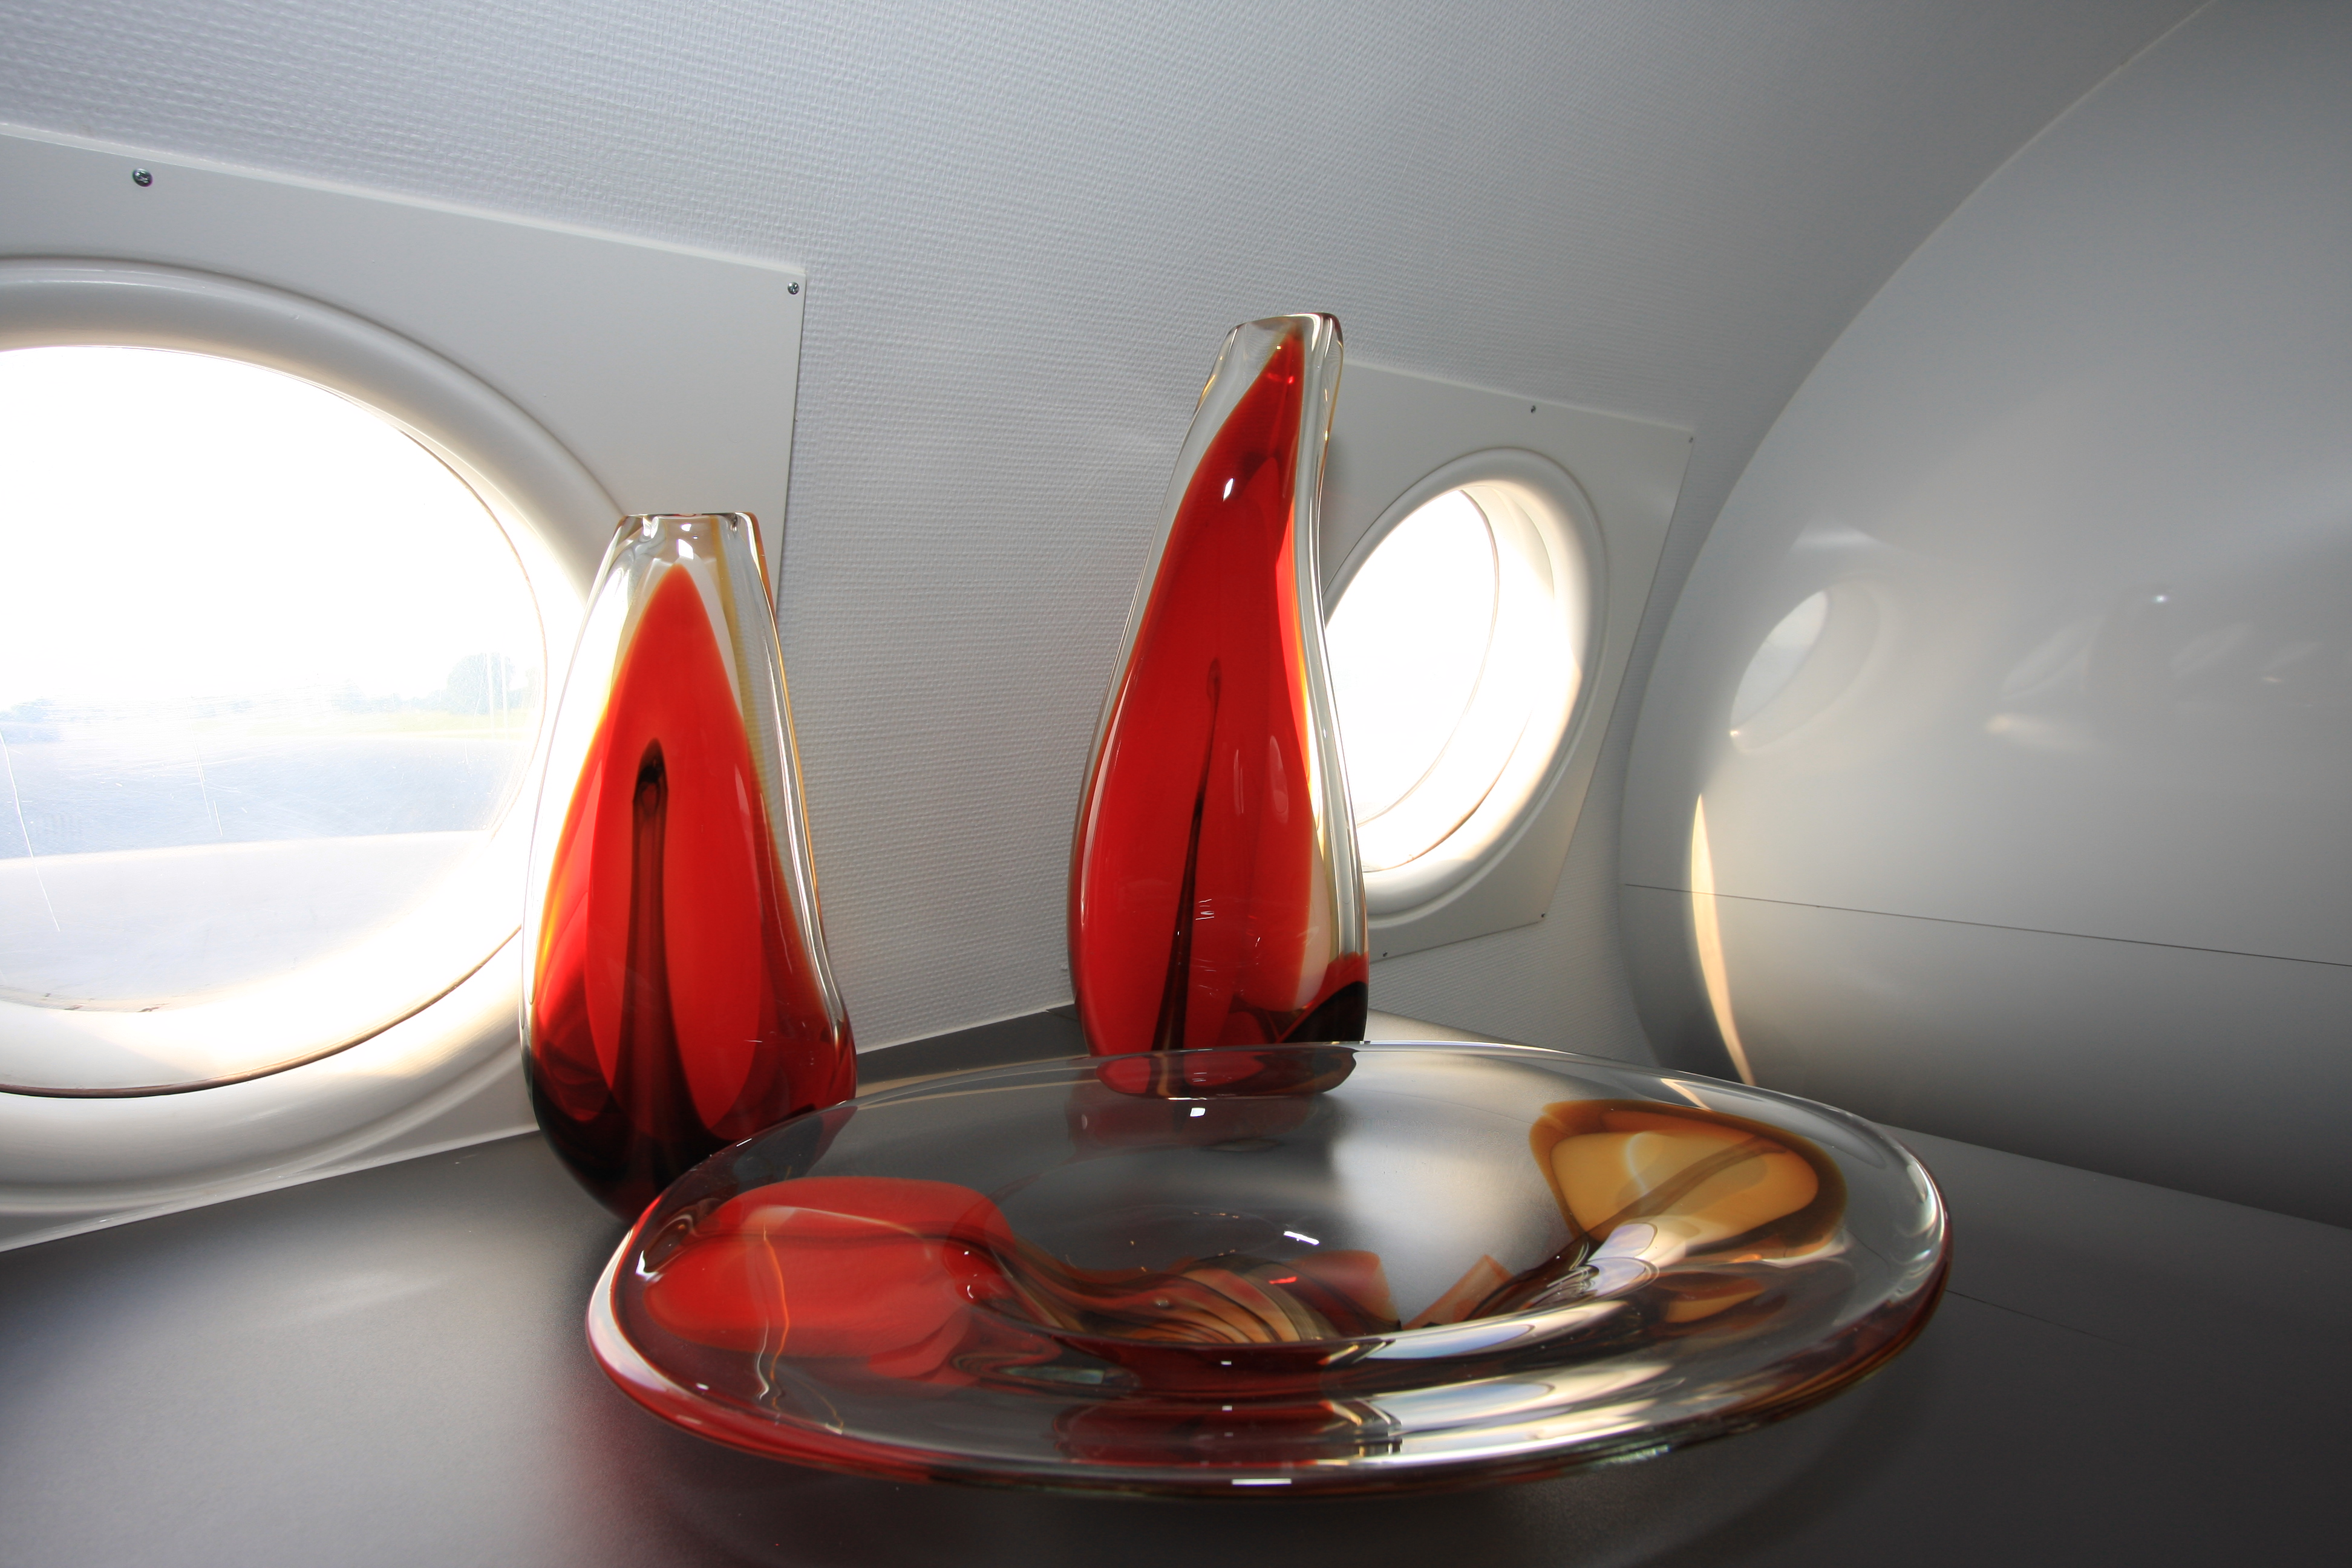 detail (Molinari glass objects)